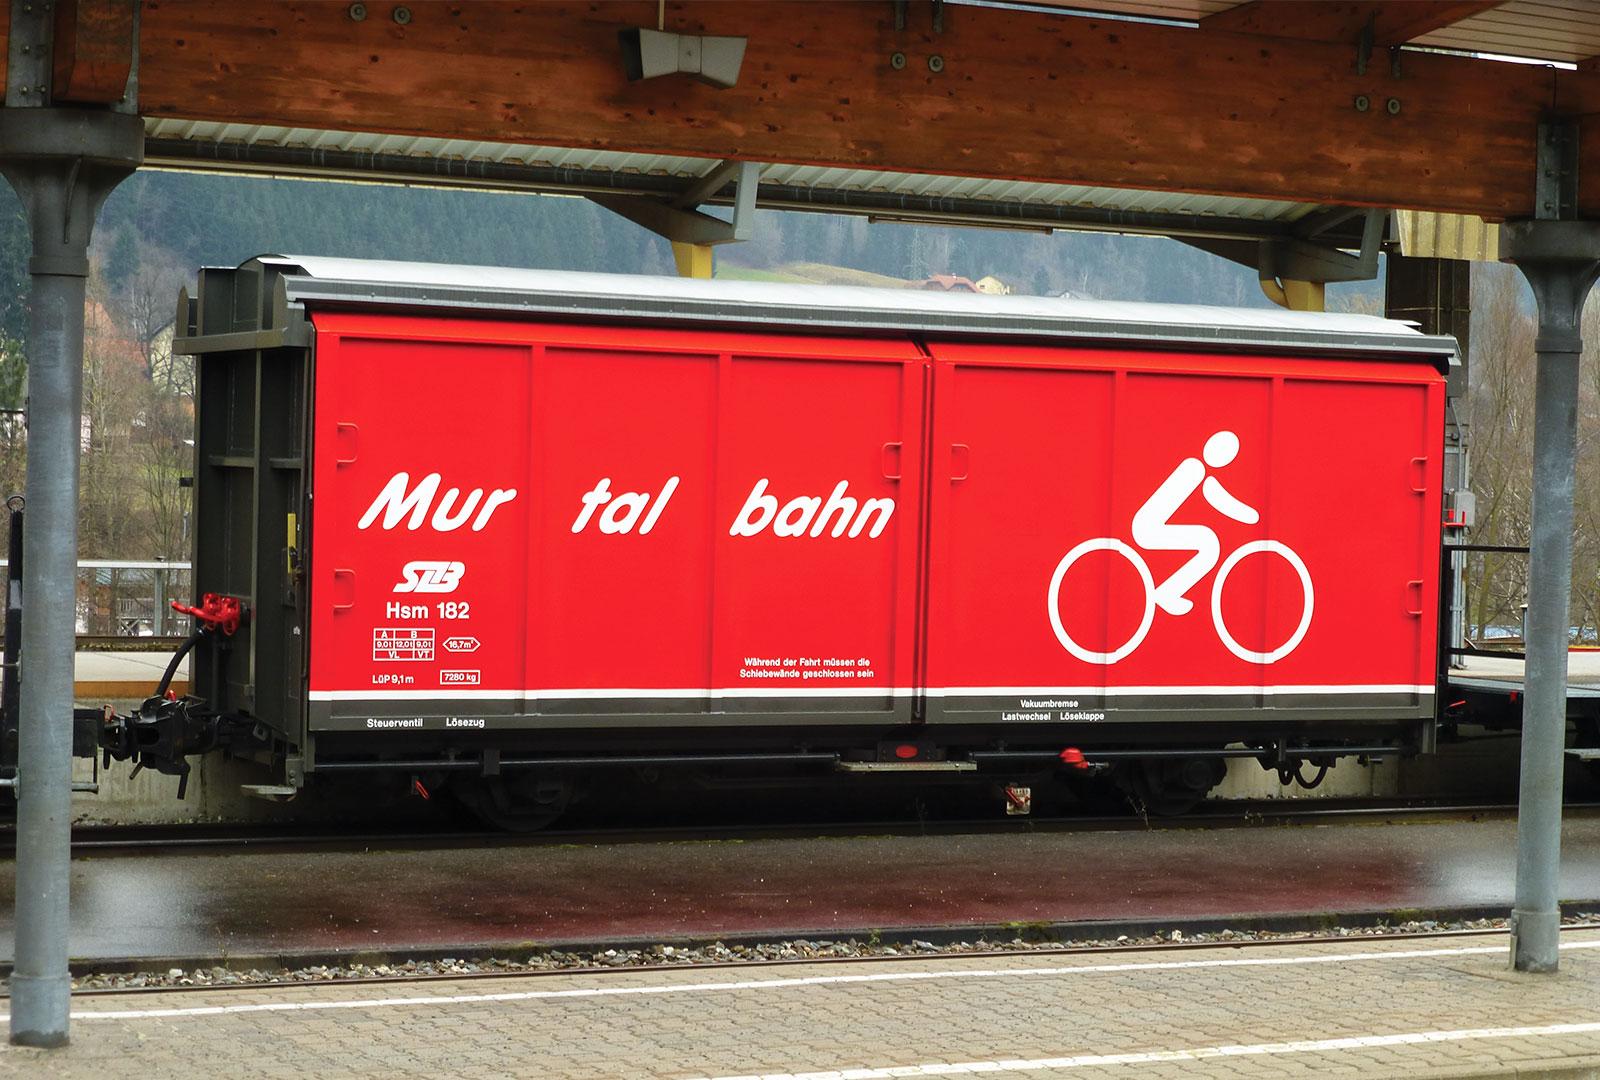 Bus-Bahn-Bike 1